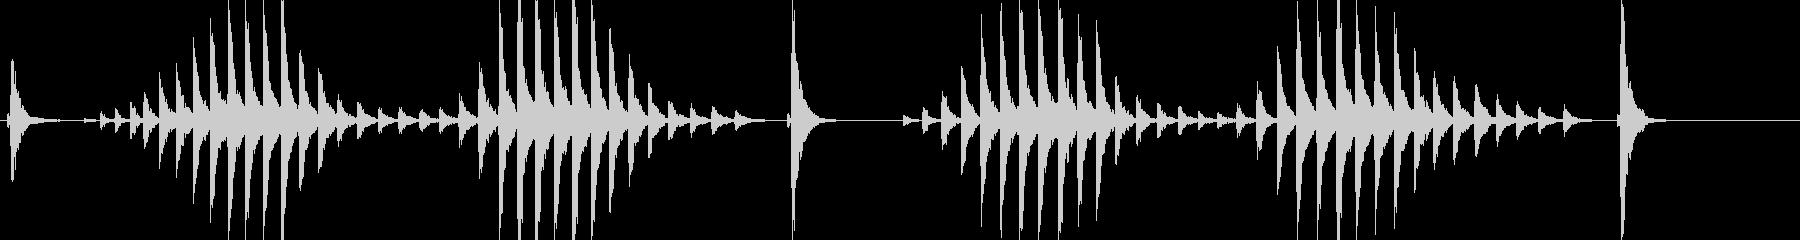 大太鼓13サザ浪歌舞伎情景描写和風和太鼓の未再生の波形